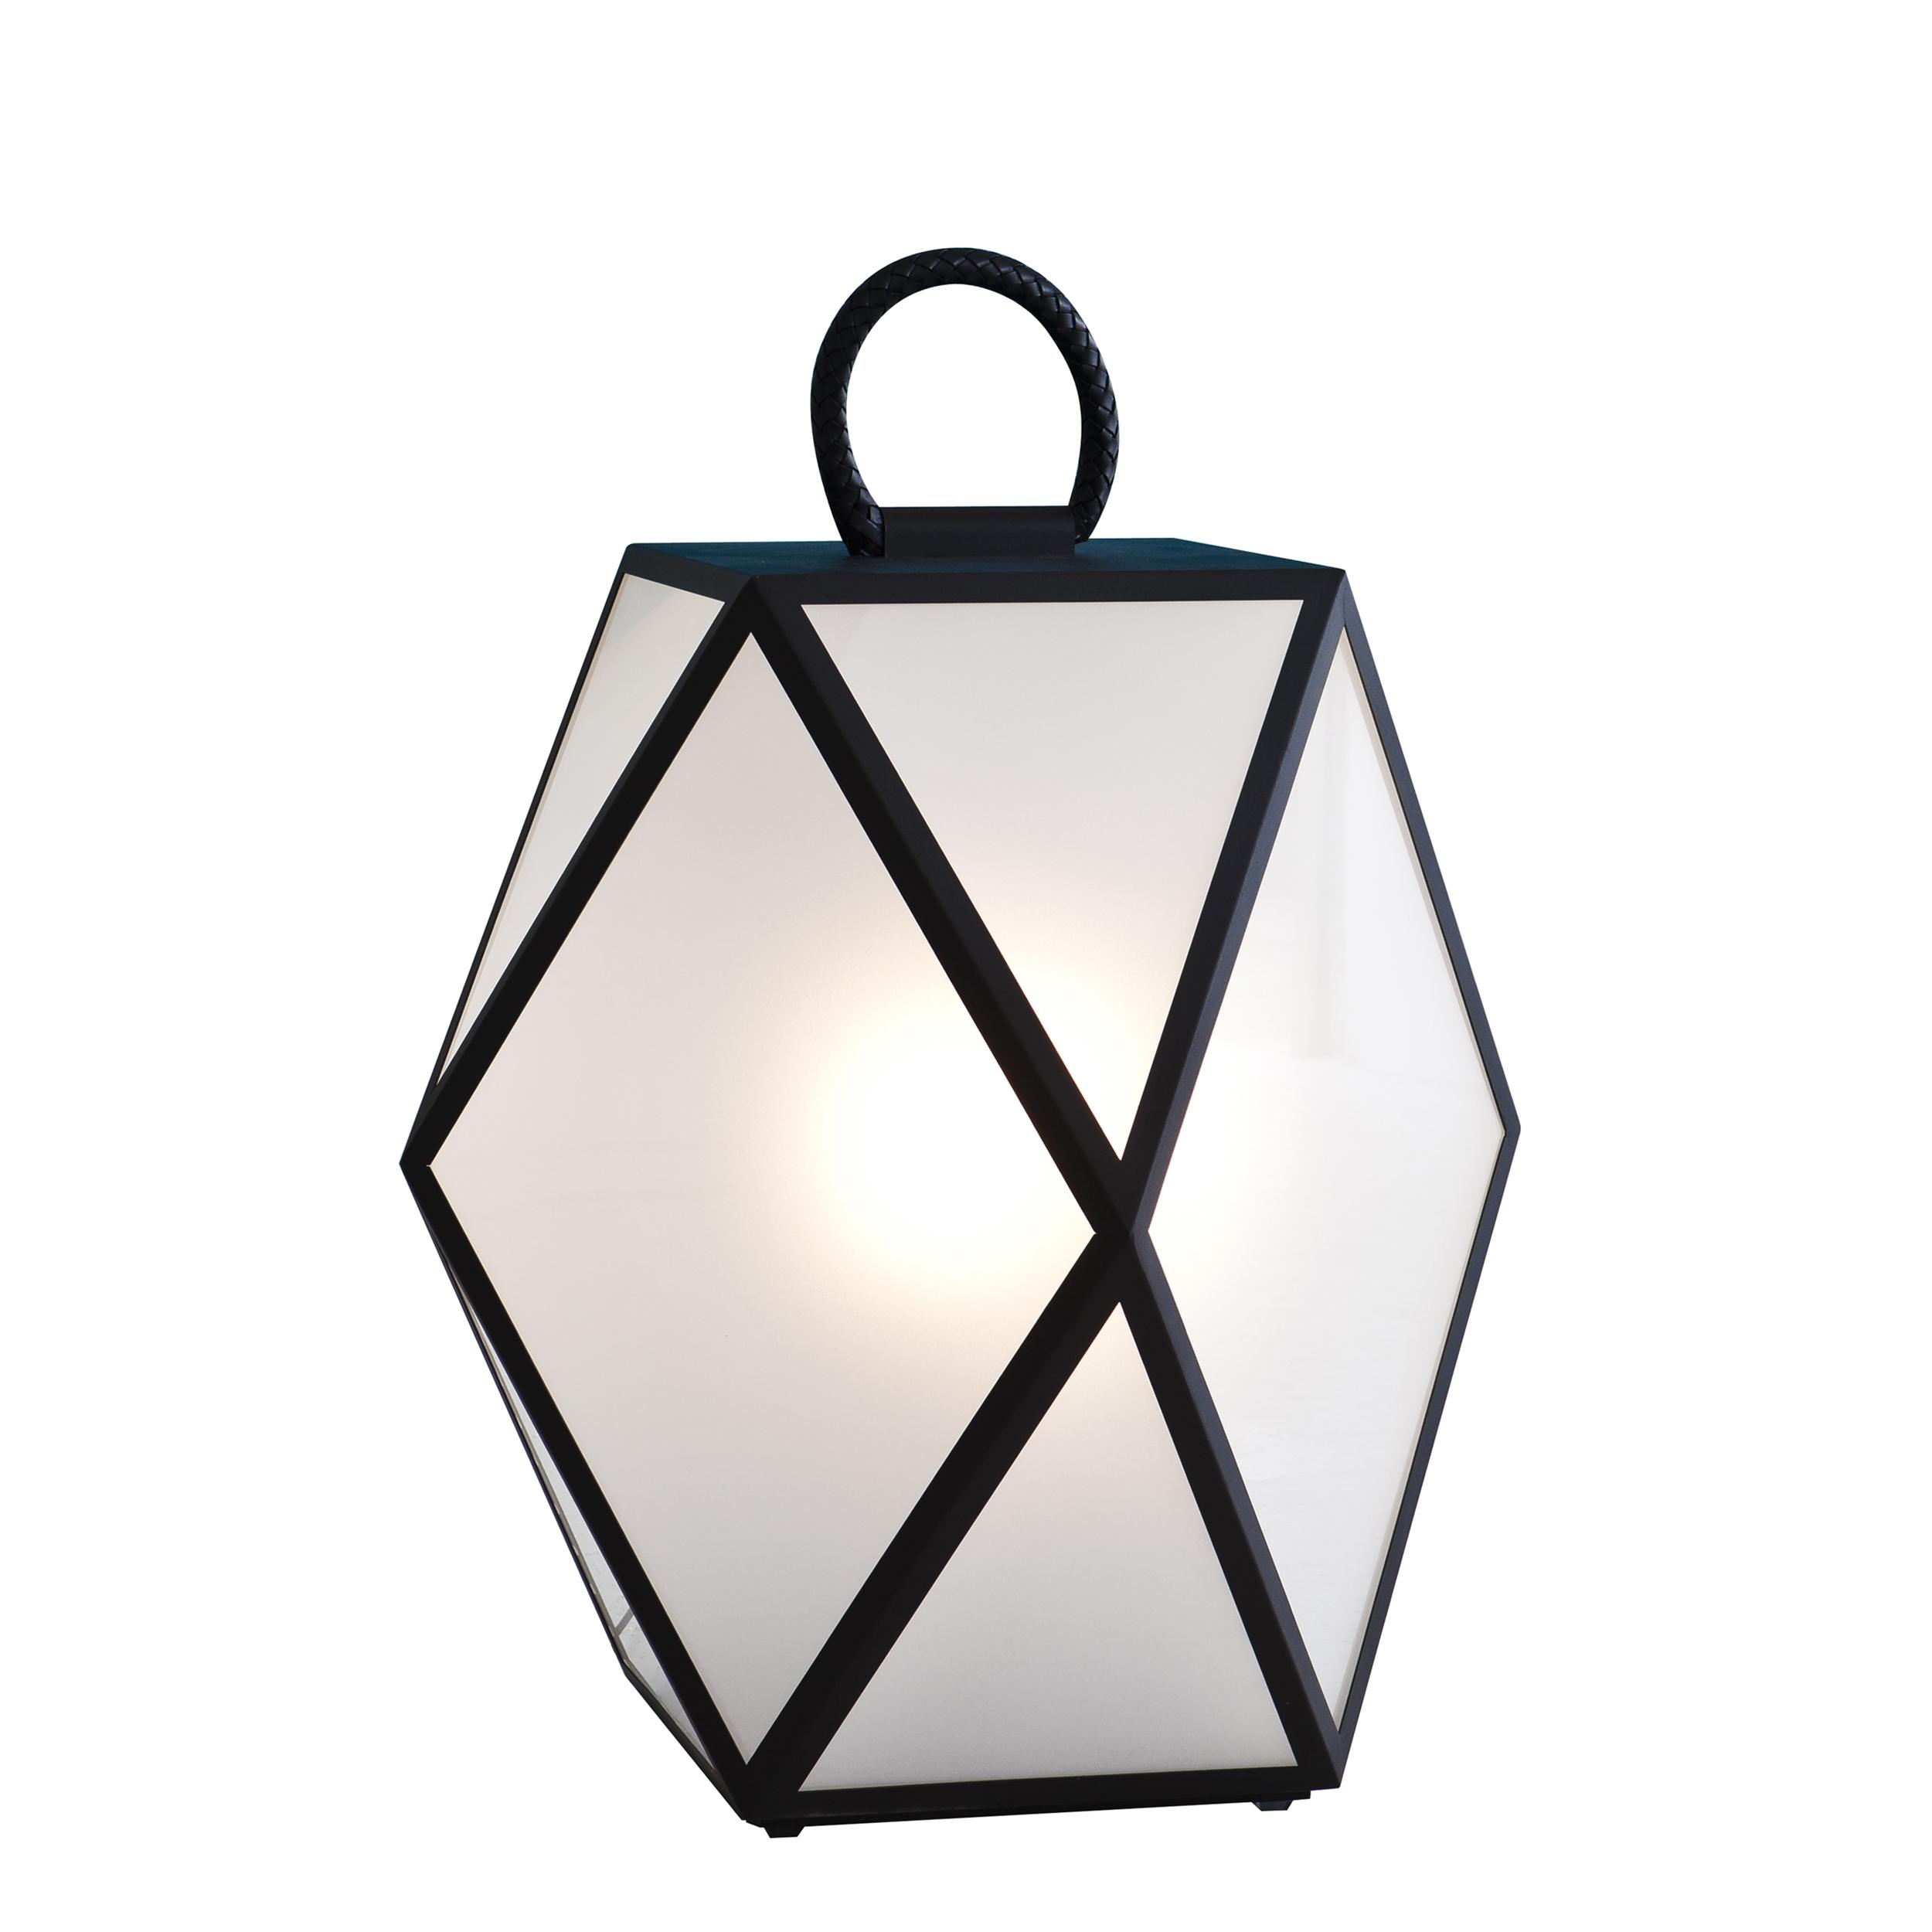 Contardi Muse Small Outdoor Floor Lamp Black